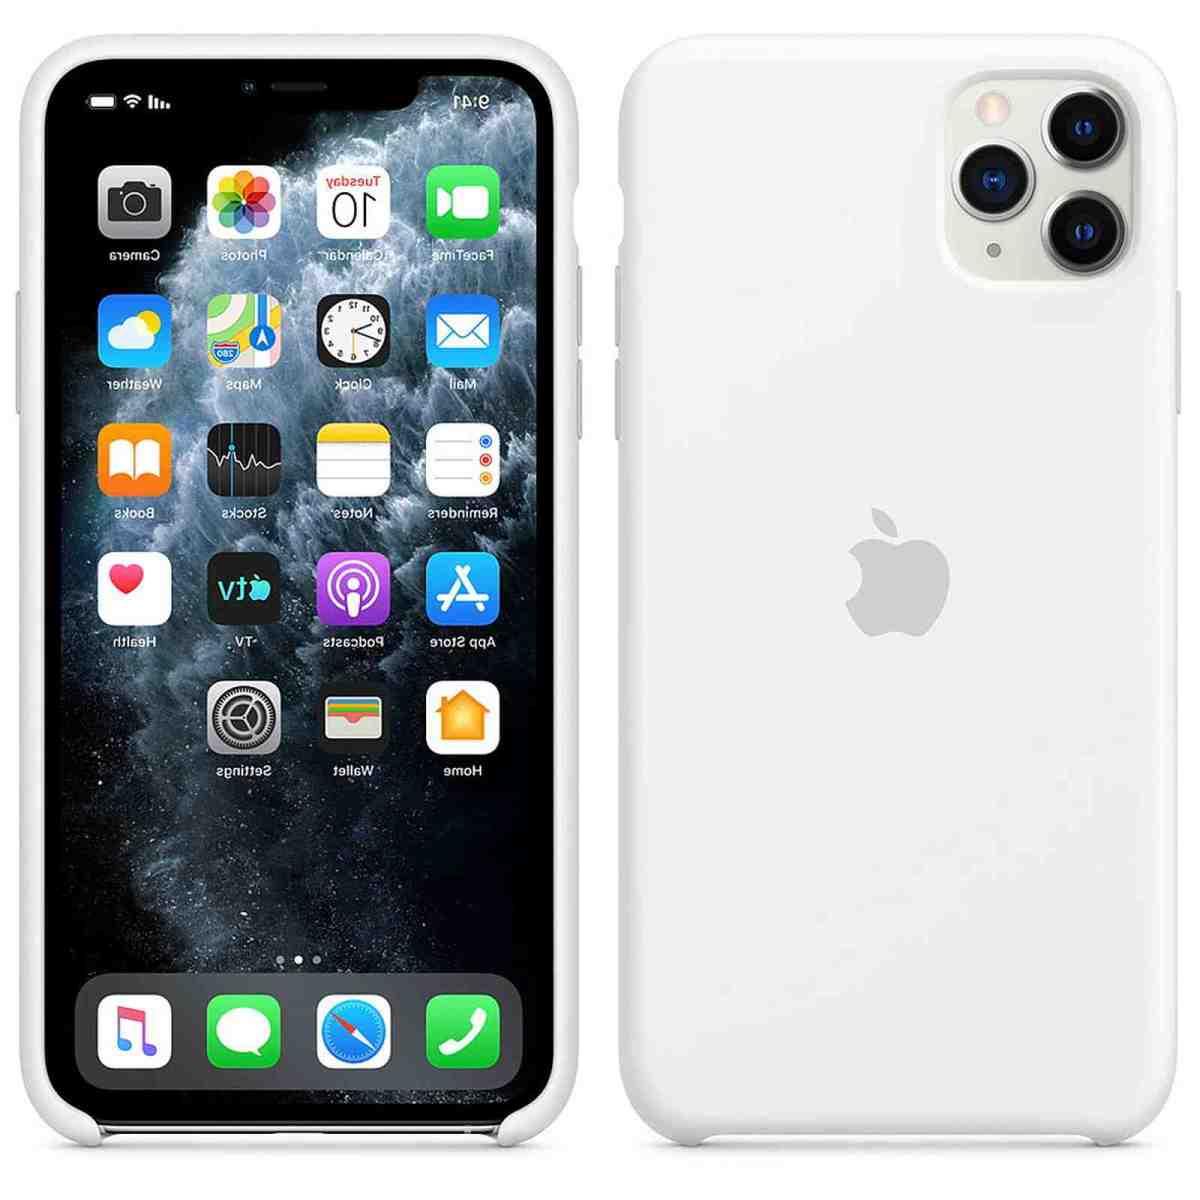 Comment organiser son ecran d'accueil iPhone iOS 14 ?